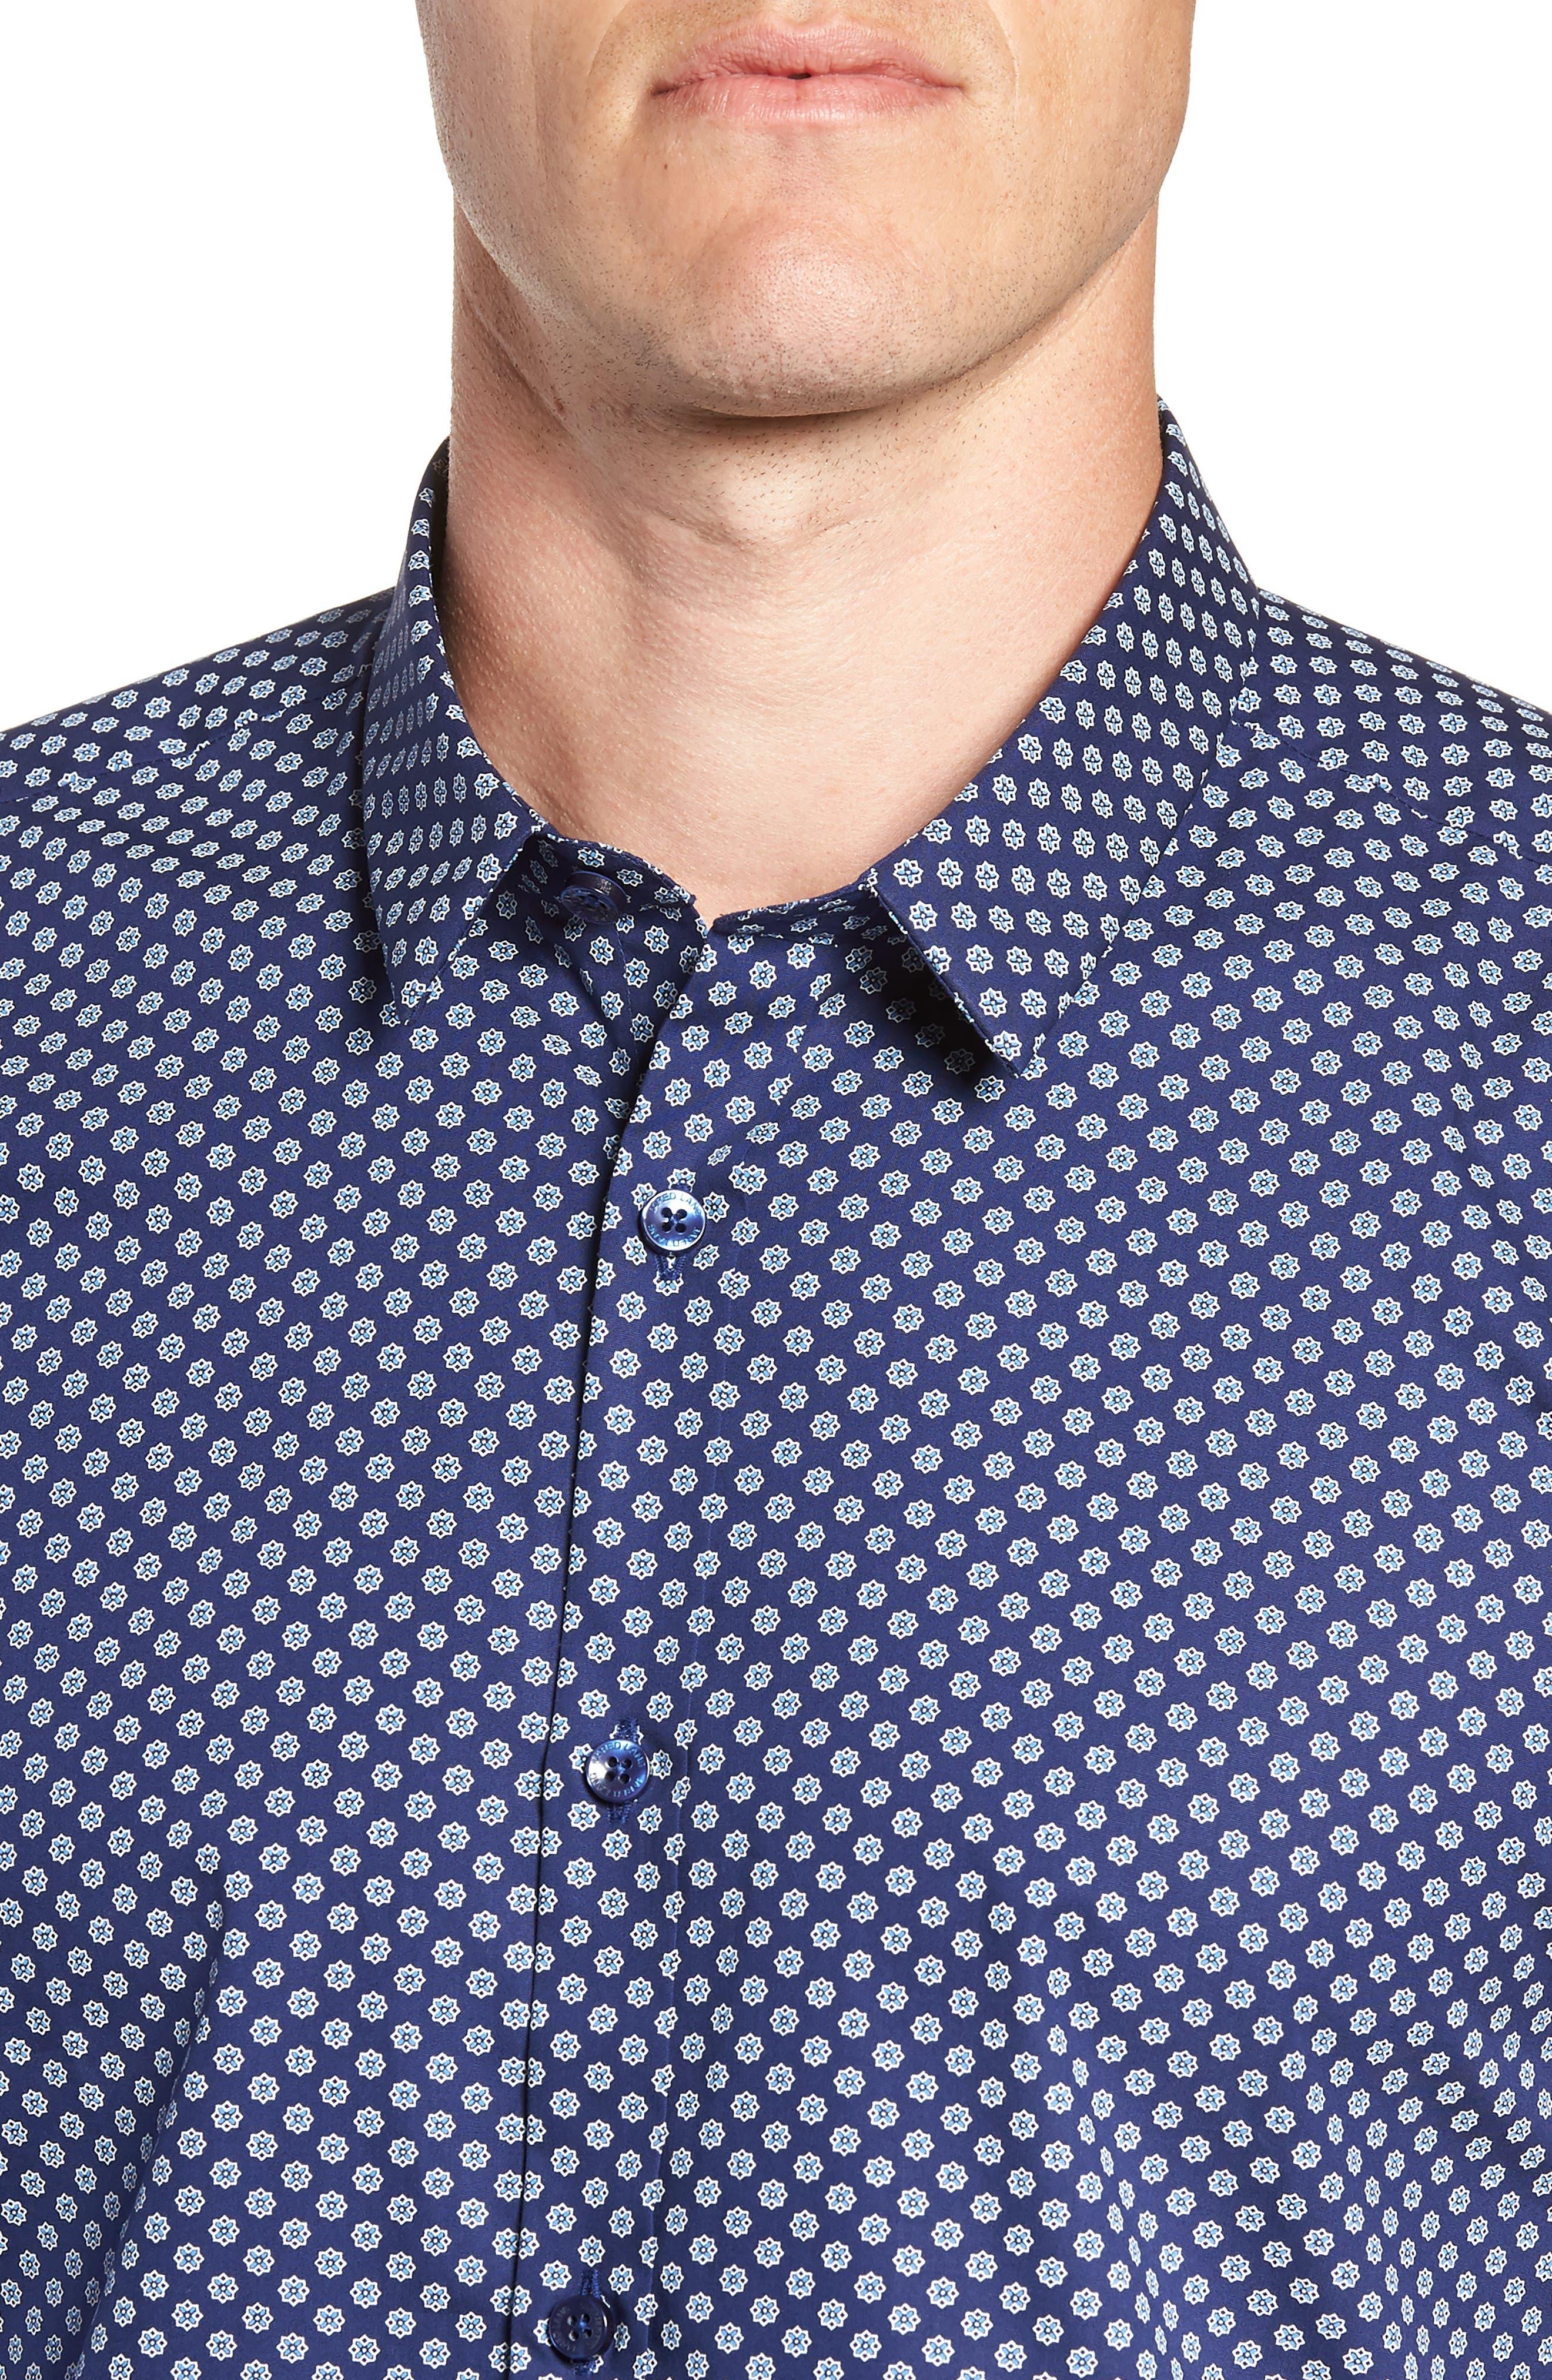 Medallion Print Sport Shirt,                             Alternate thumbnail 2, color,                             Blue Micro Print